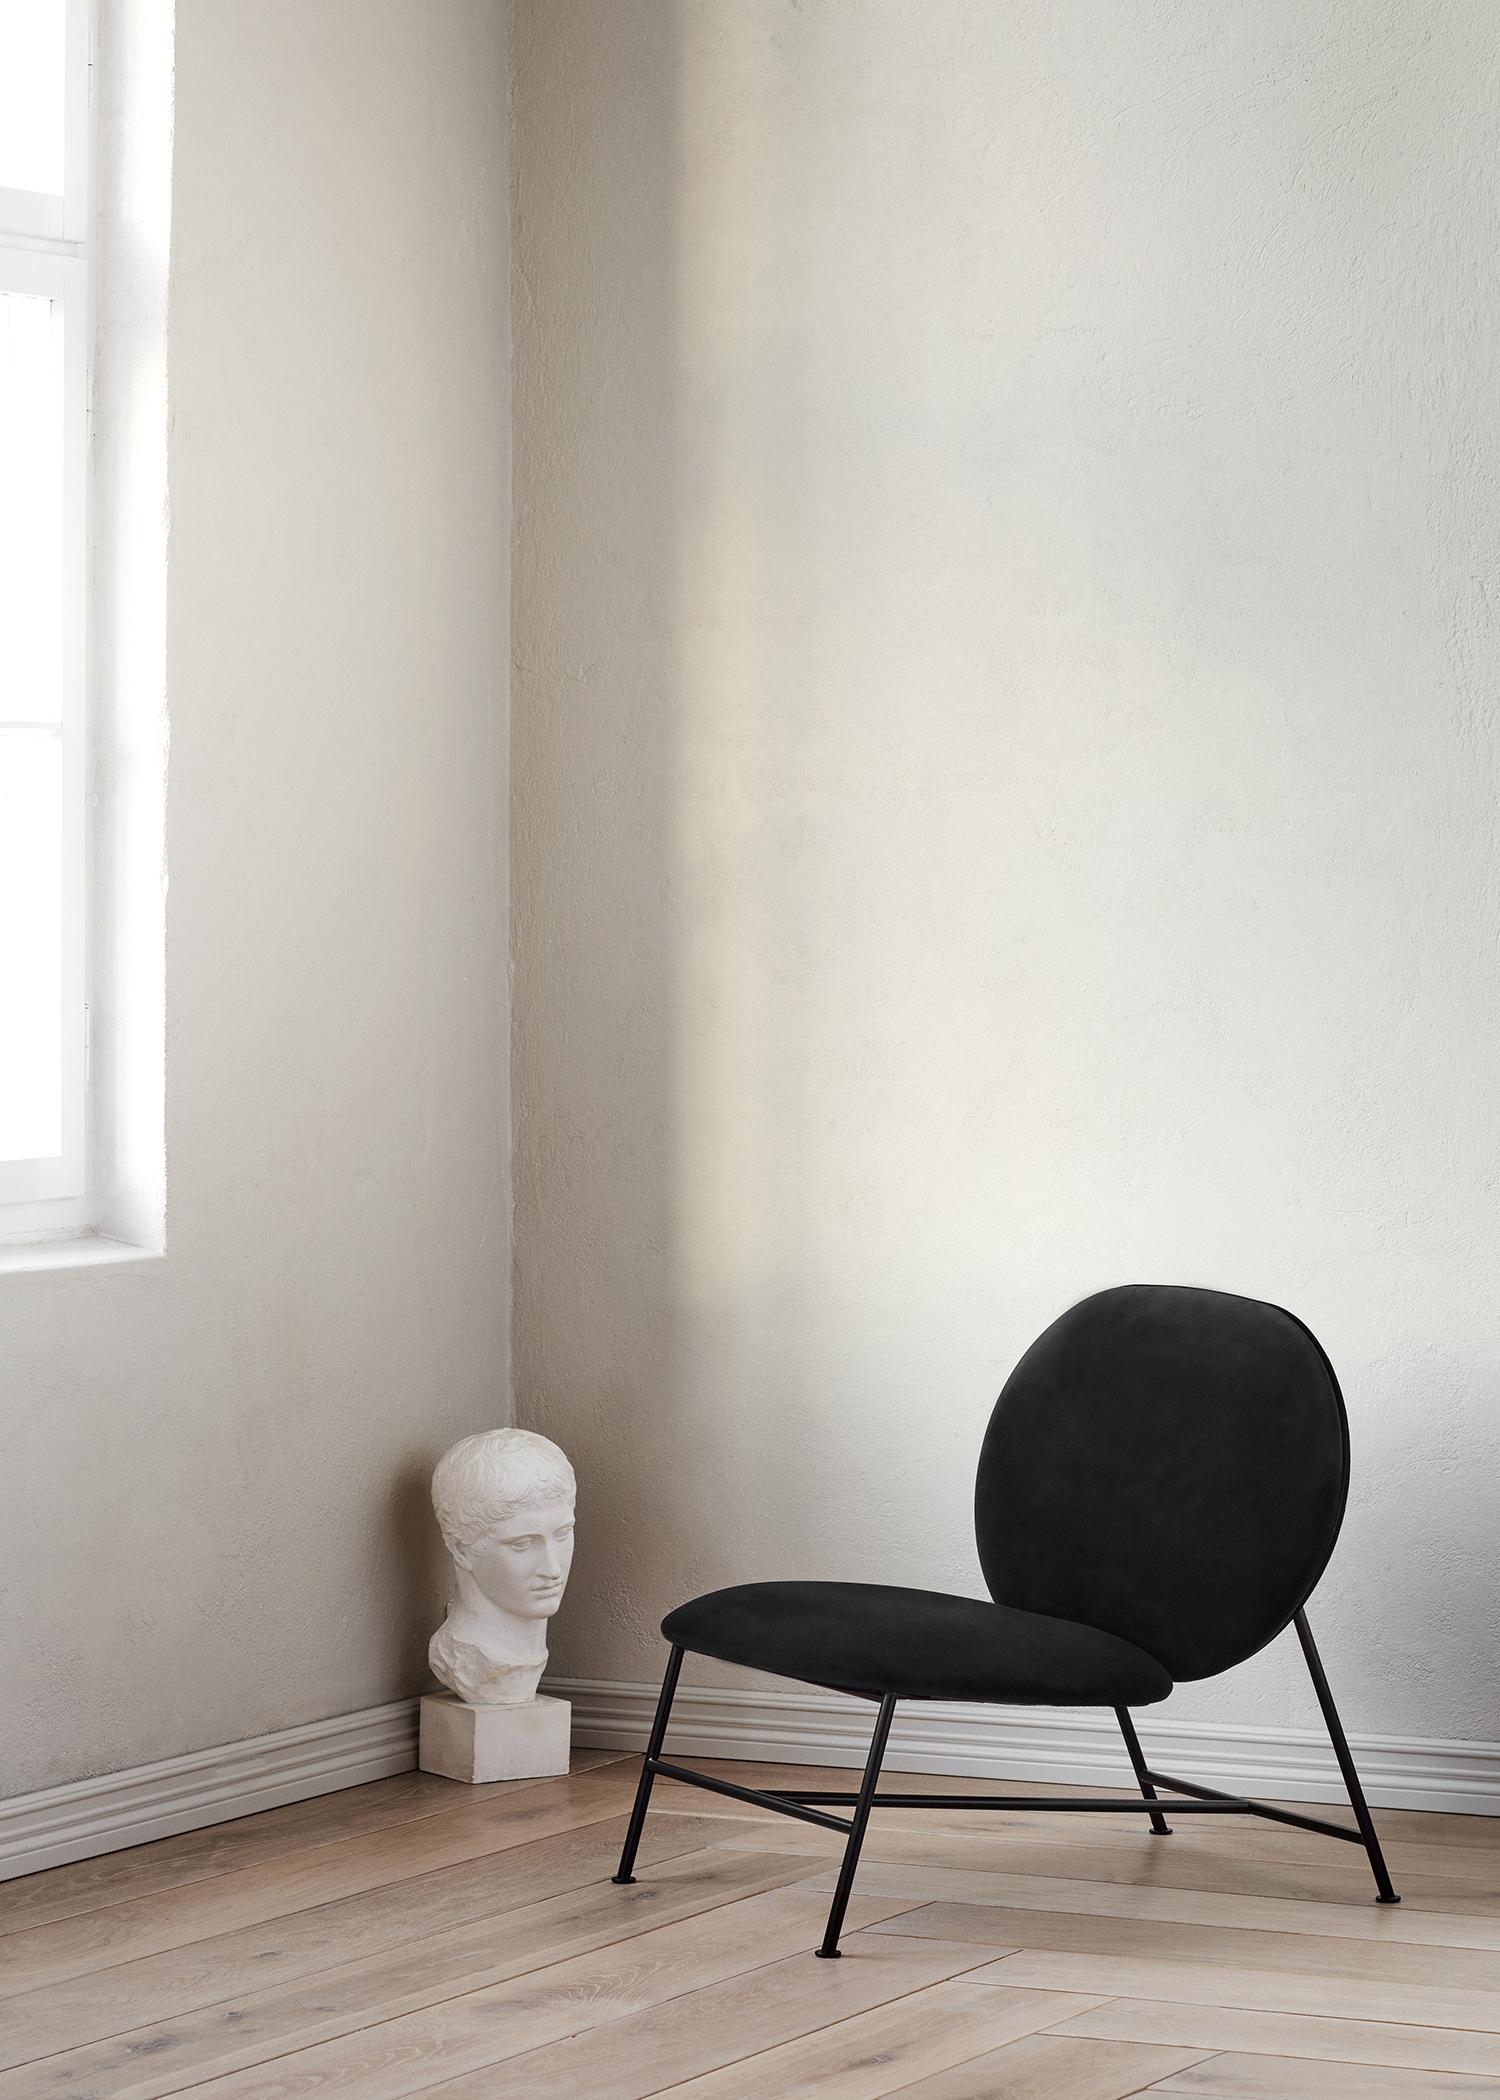 Oblong_lounge_chair_black-Northern_Photo_Chris_-Tonnesen-High-res.jpg